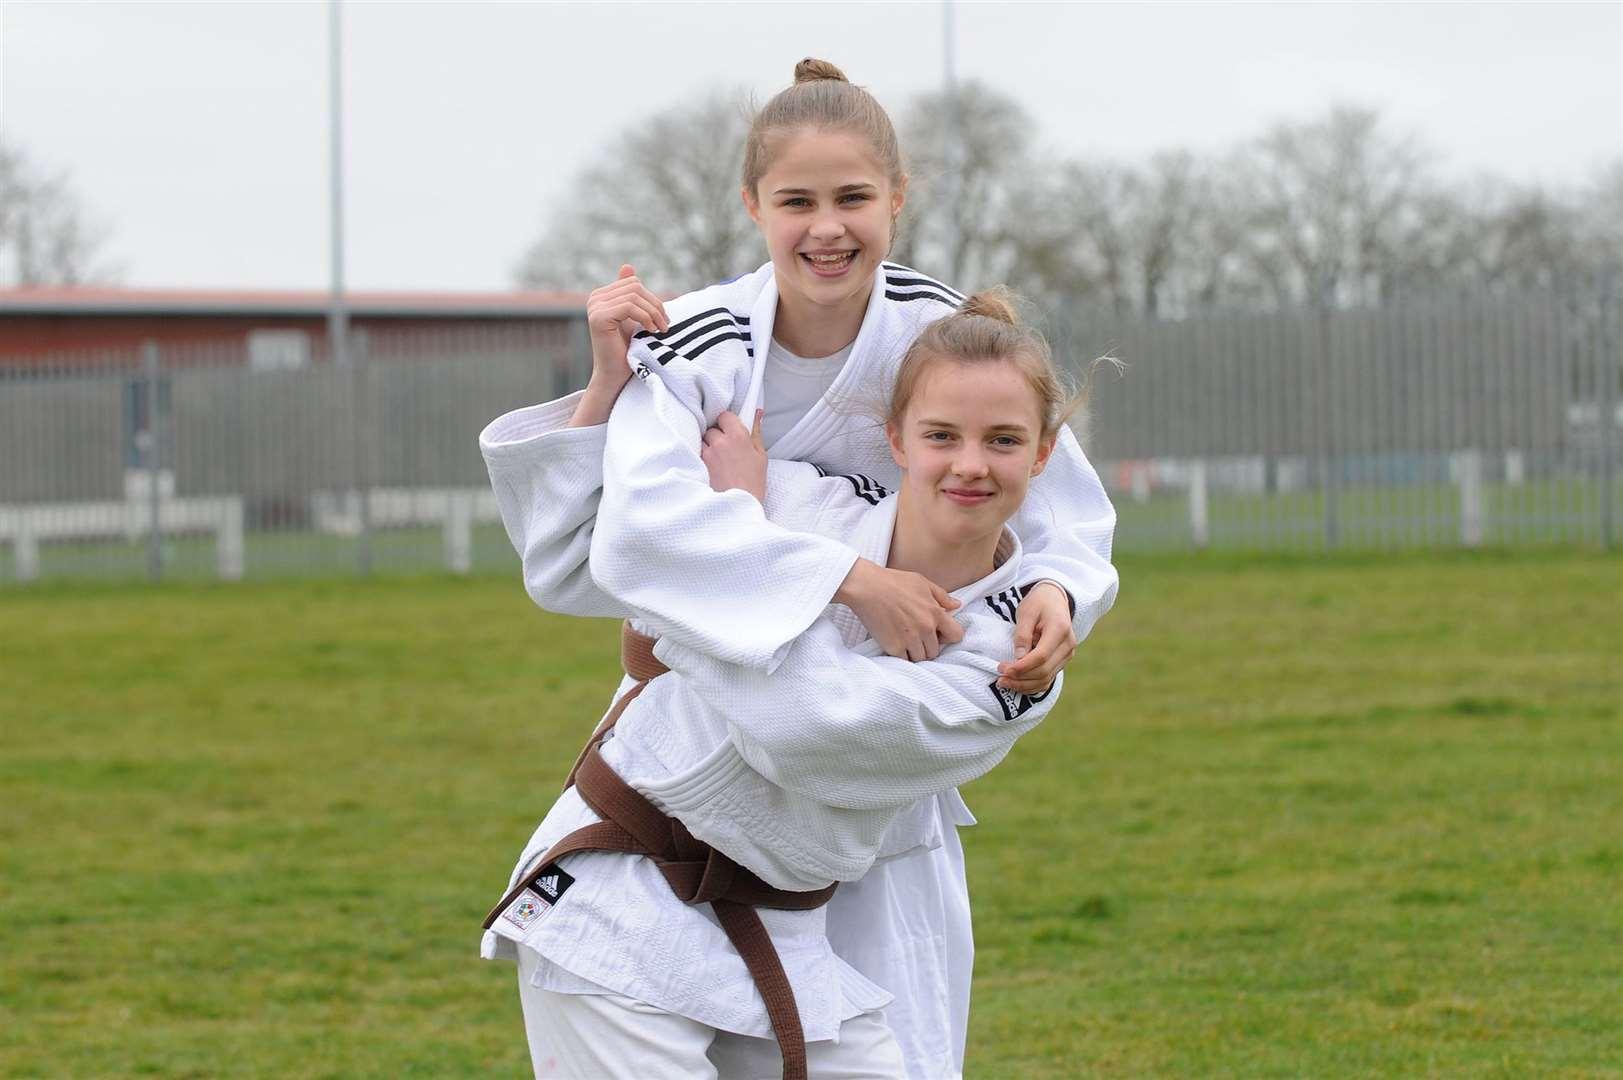 Eden and Niamh Southgate. Picture: Mecha Morton